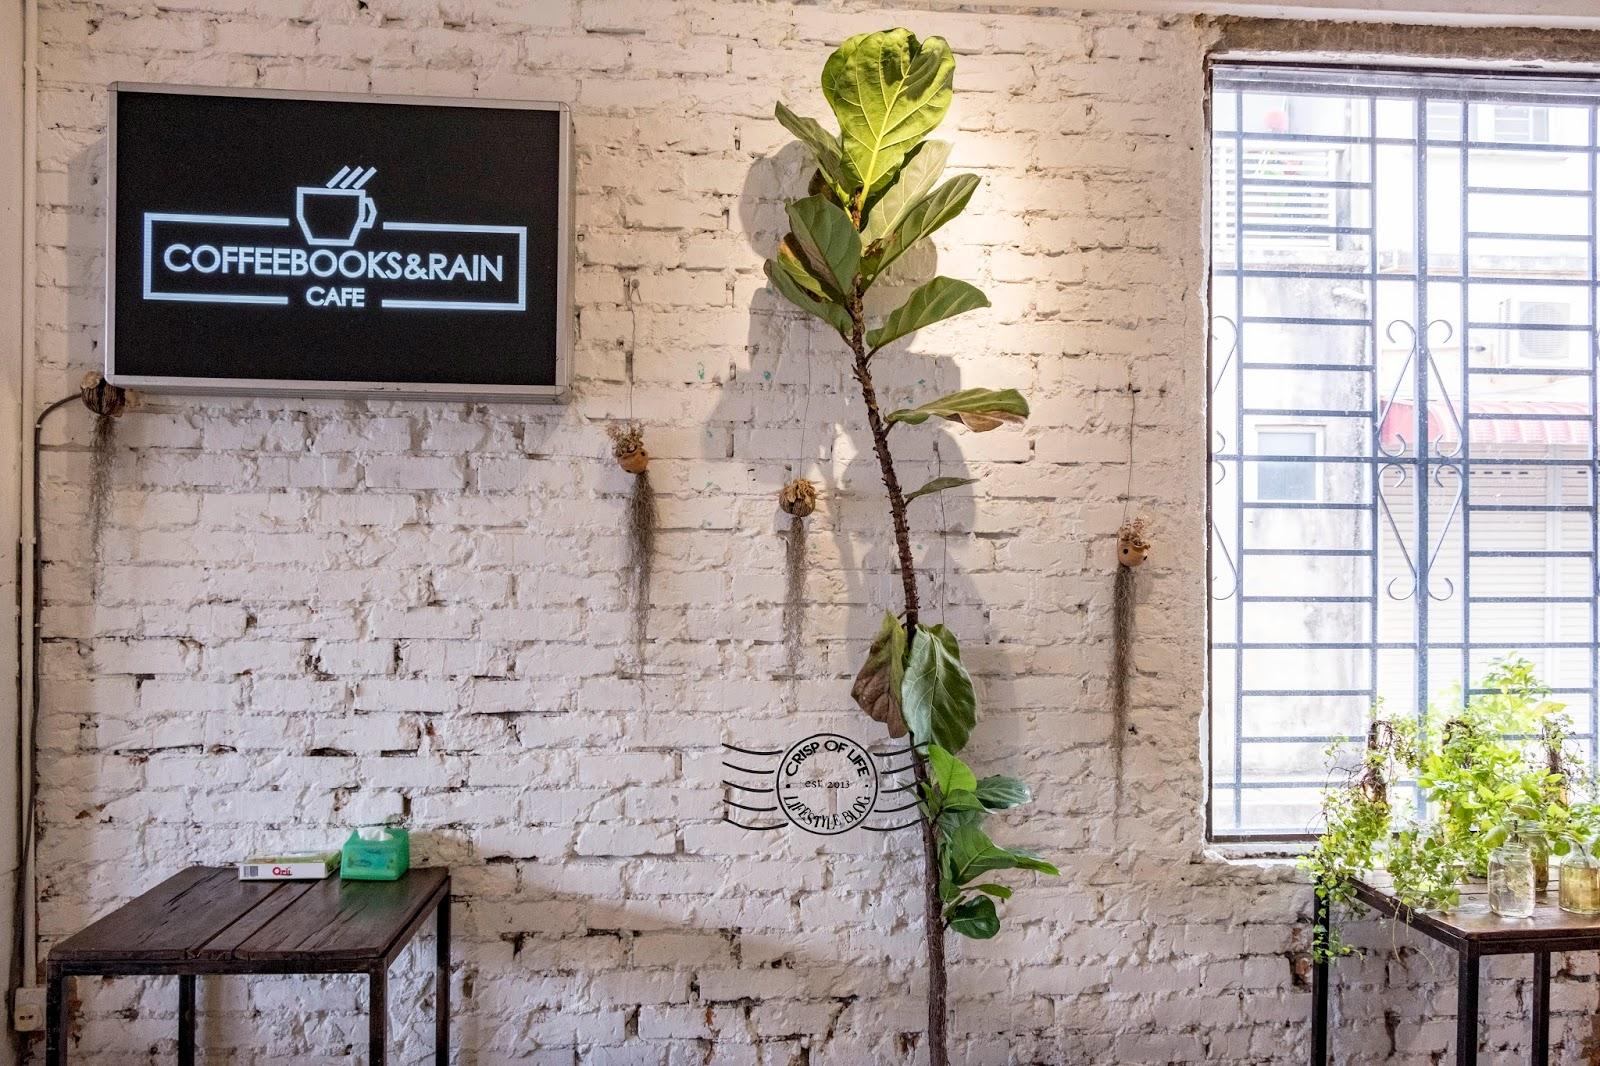 Coffee Books & Rain Cafe Alor Setar Kedah